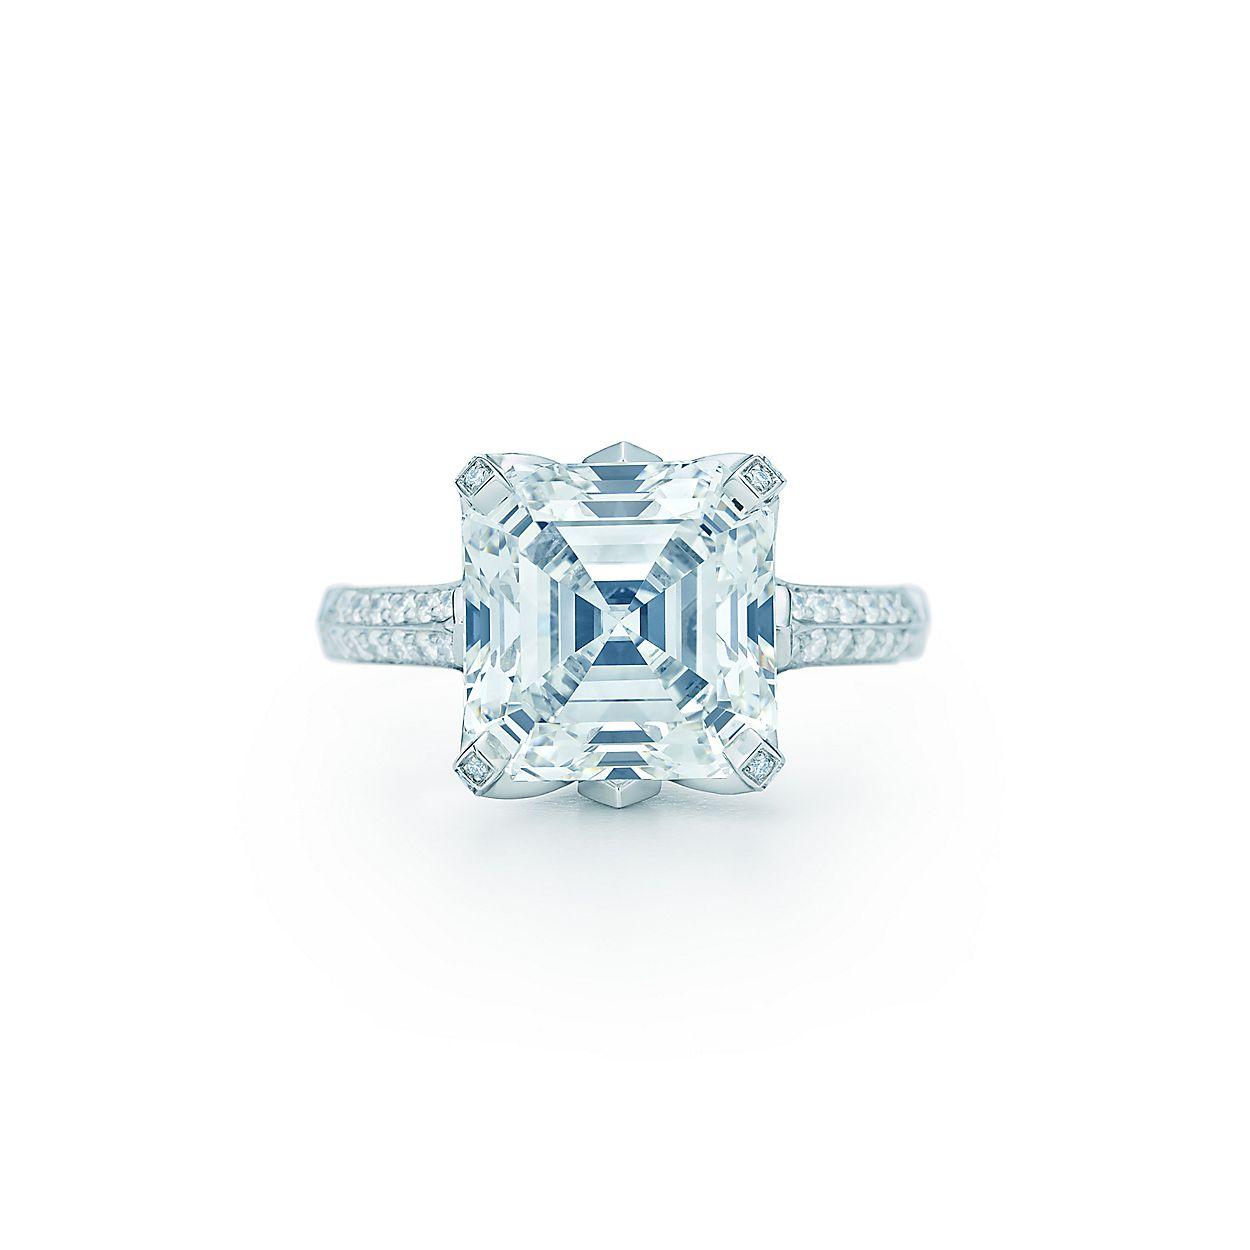 Square Step Cut Diamond Ring In Platinum With Round Brilliant Diamonds Tiffany Co